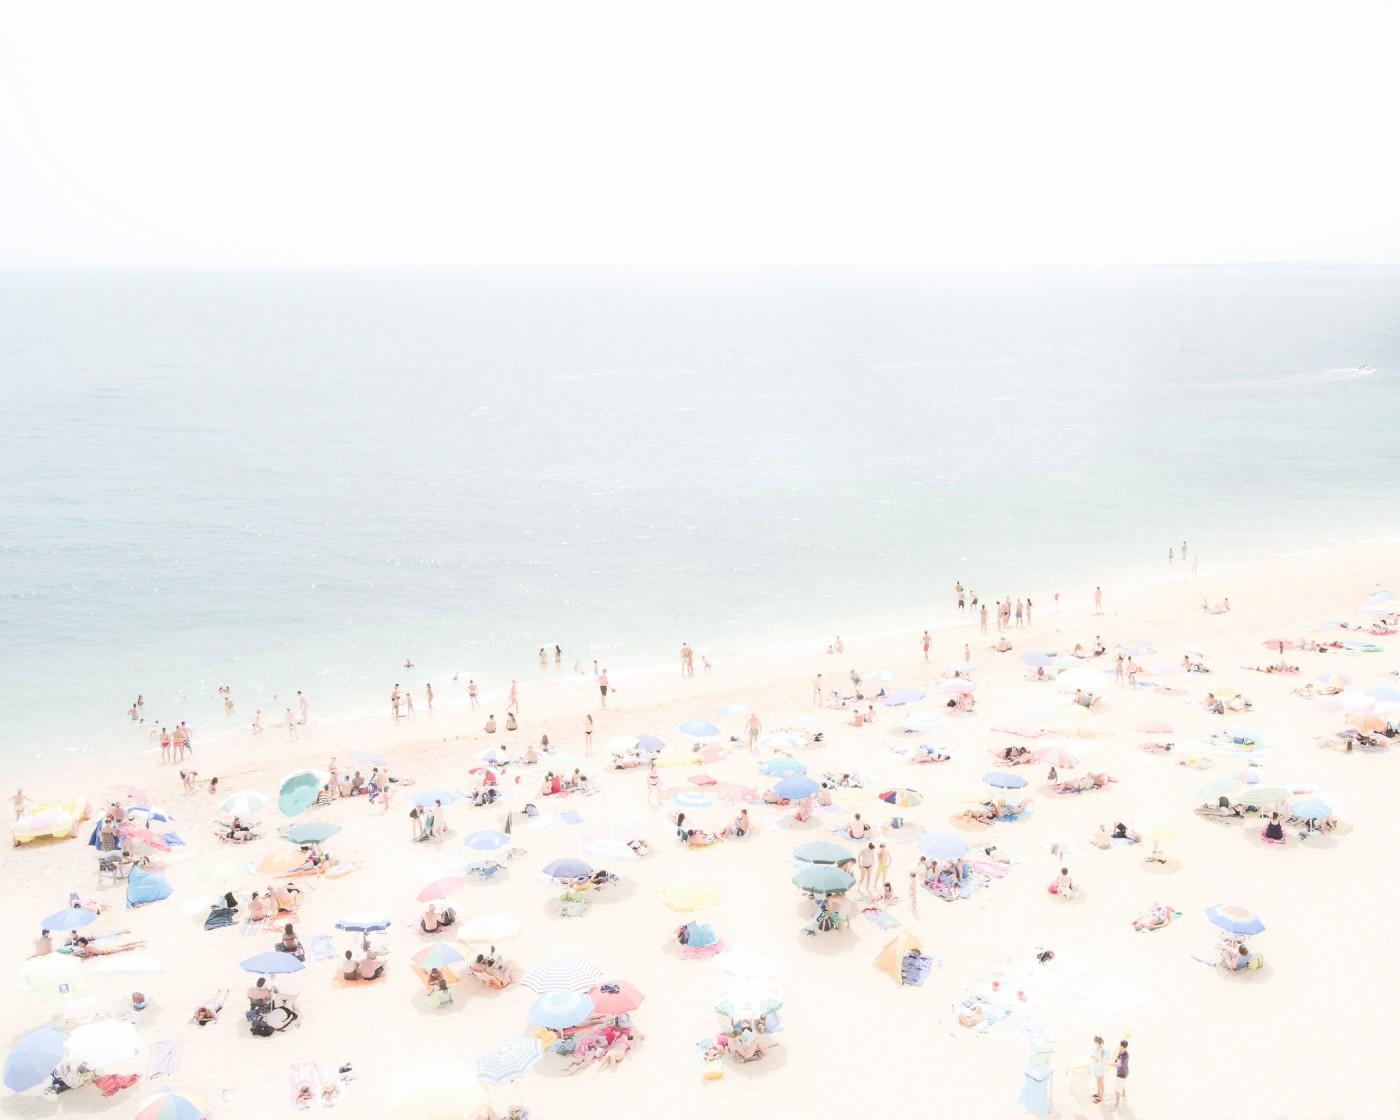 Joshua Jensen-Nagle, </span><span><em>A Young Lover's Dream</em>, </span><span>2013 Courtesy of the artist and Bau-Xi Photo